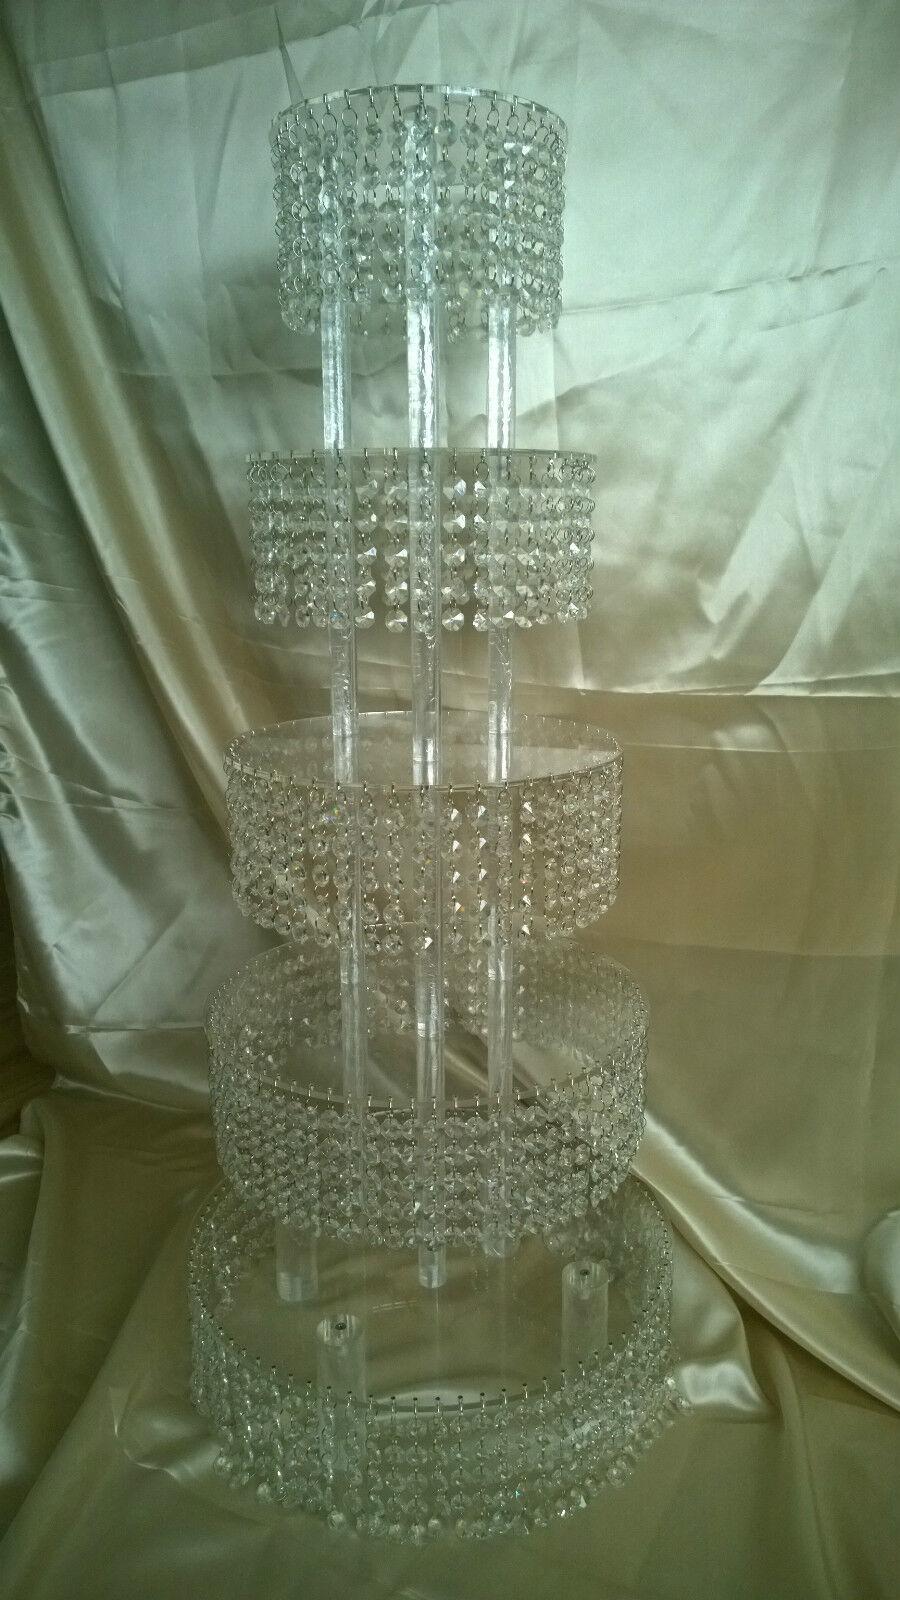 Crystal cupcake ou gateau stand tour 2, 3 ou 4 rangées cristal lustre style